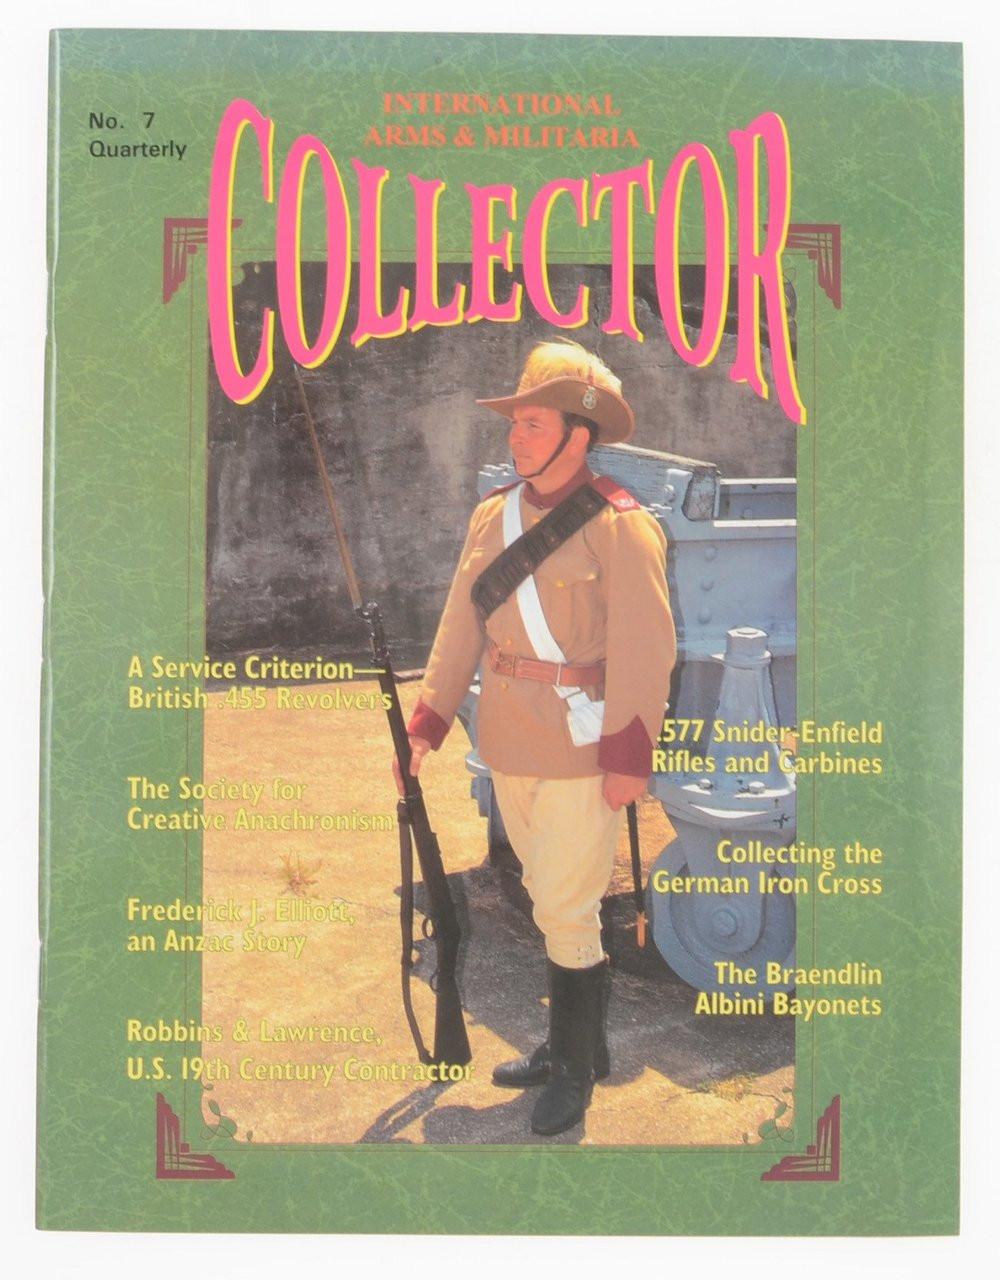 International Arms & Militaria Collector No. 7